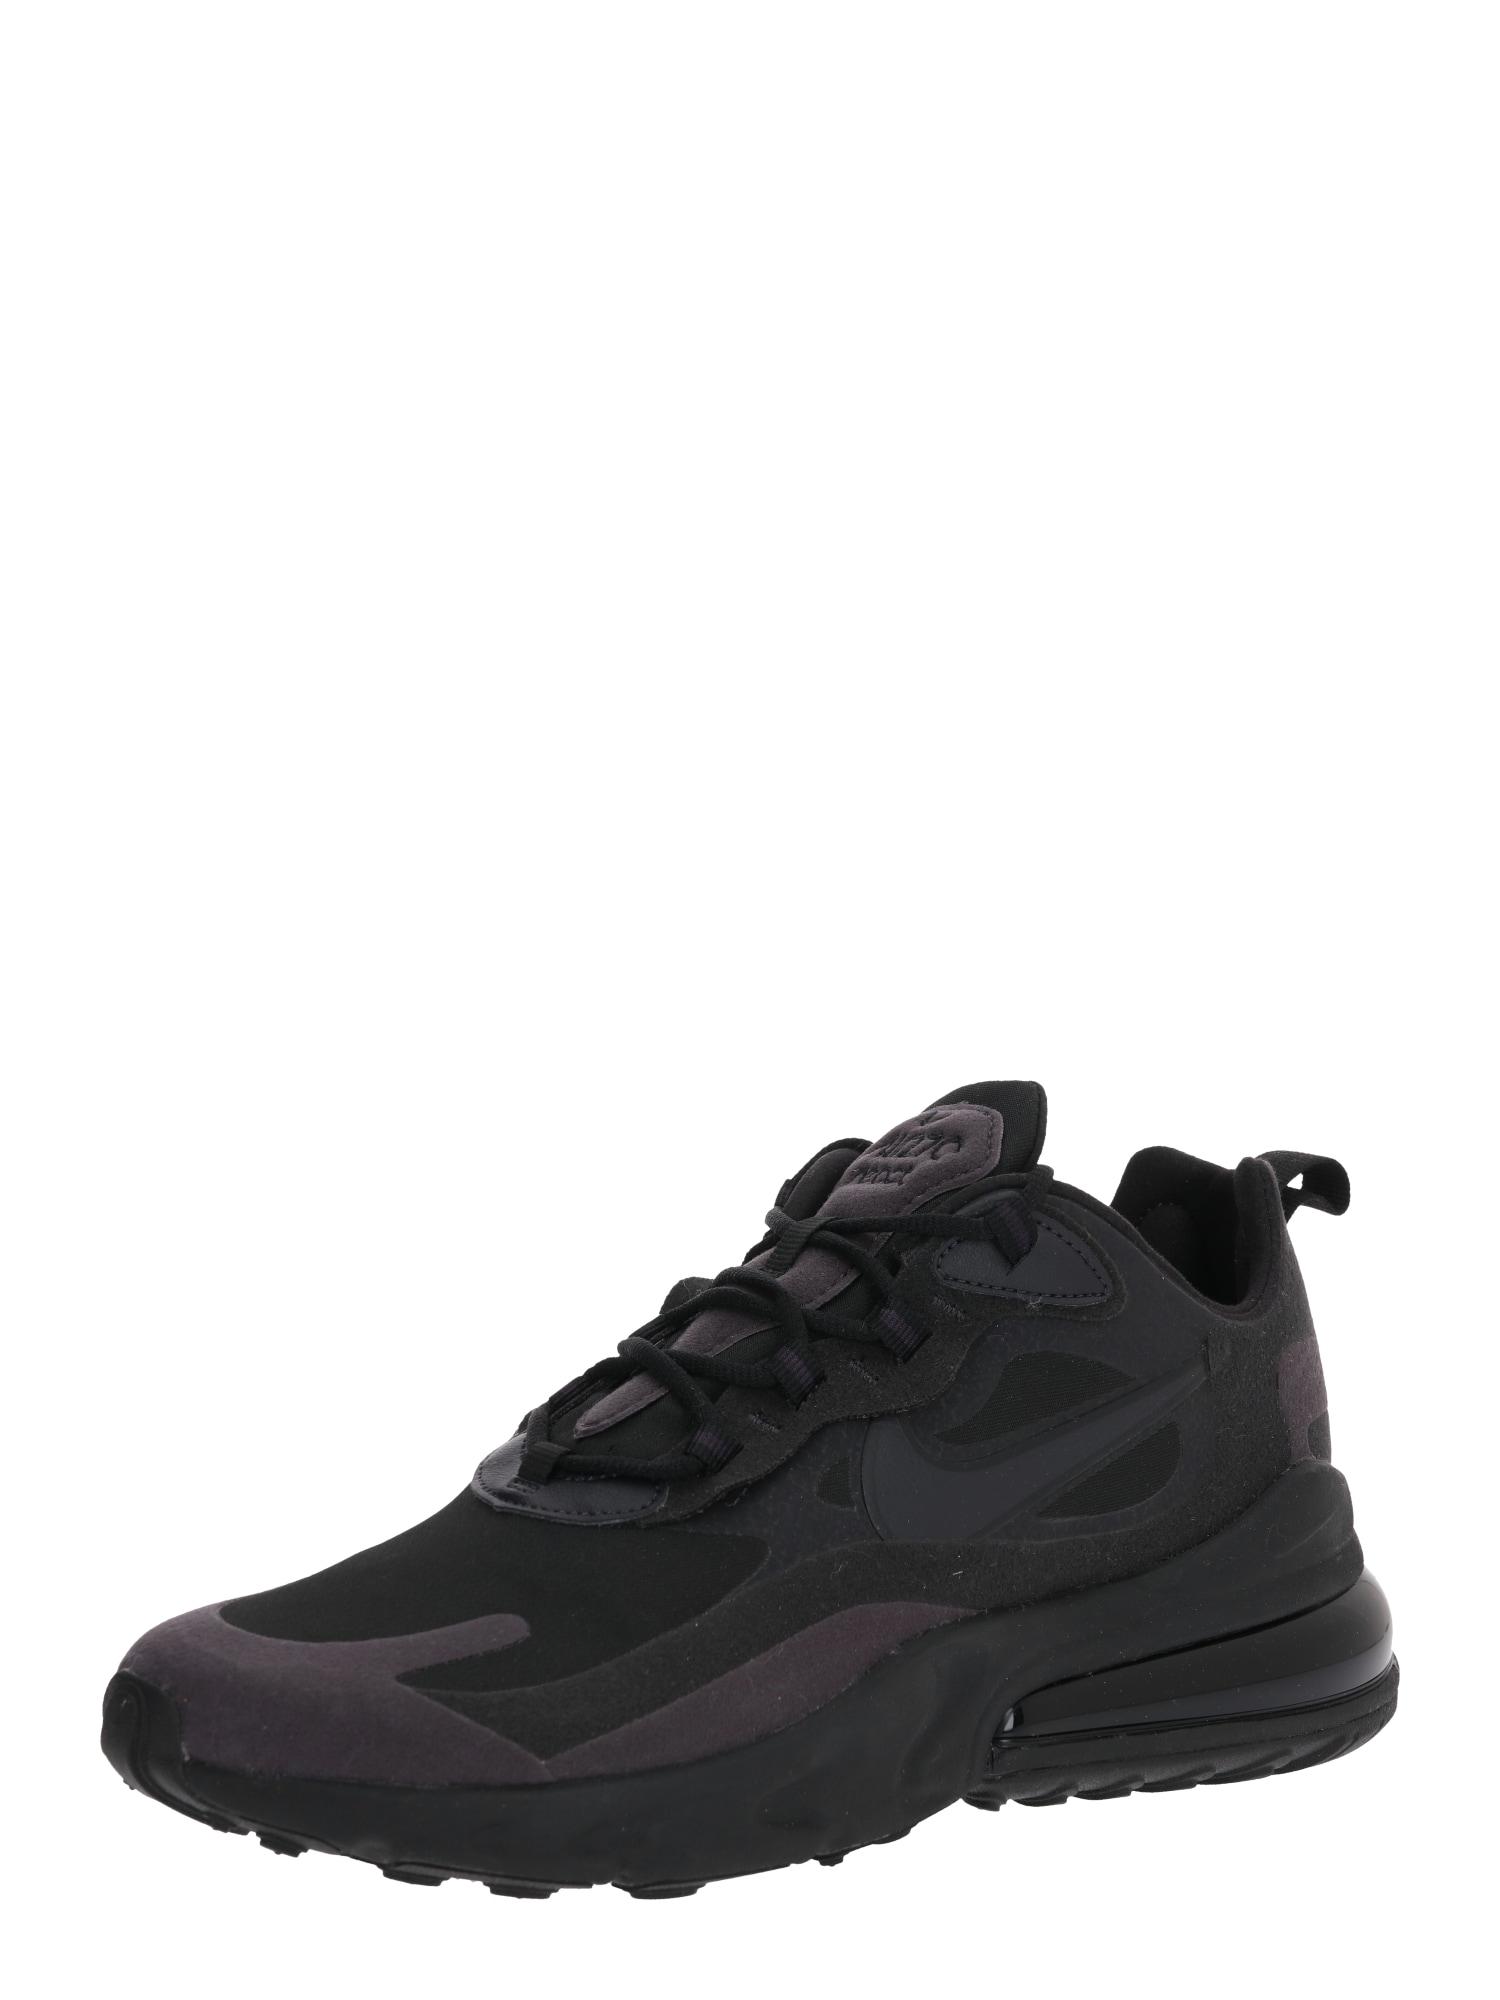 Nike Sportswear Nízke tenisky 'Nike Air Max 270 React'  tmavosivá / čierna